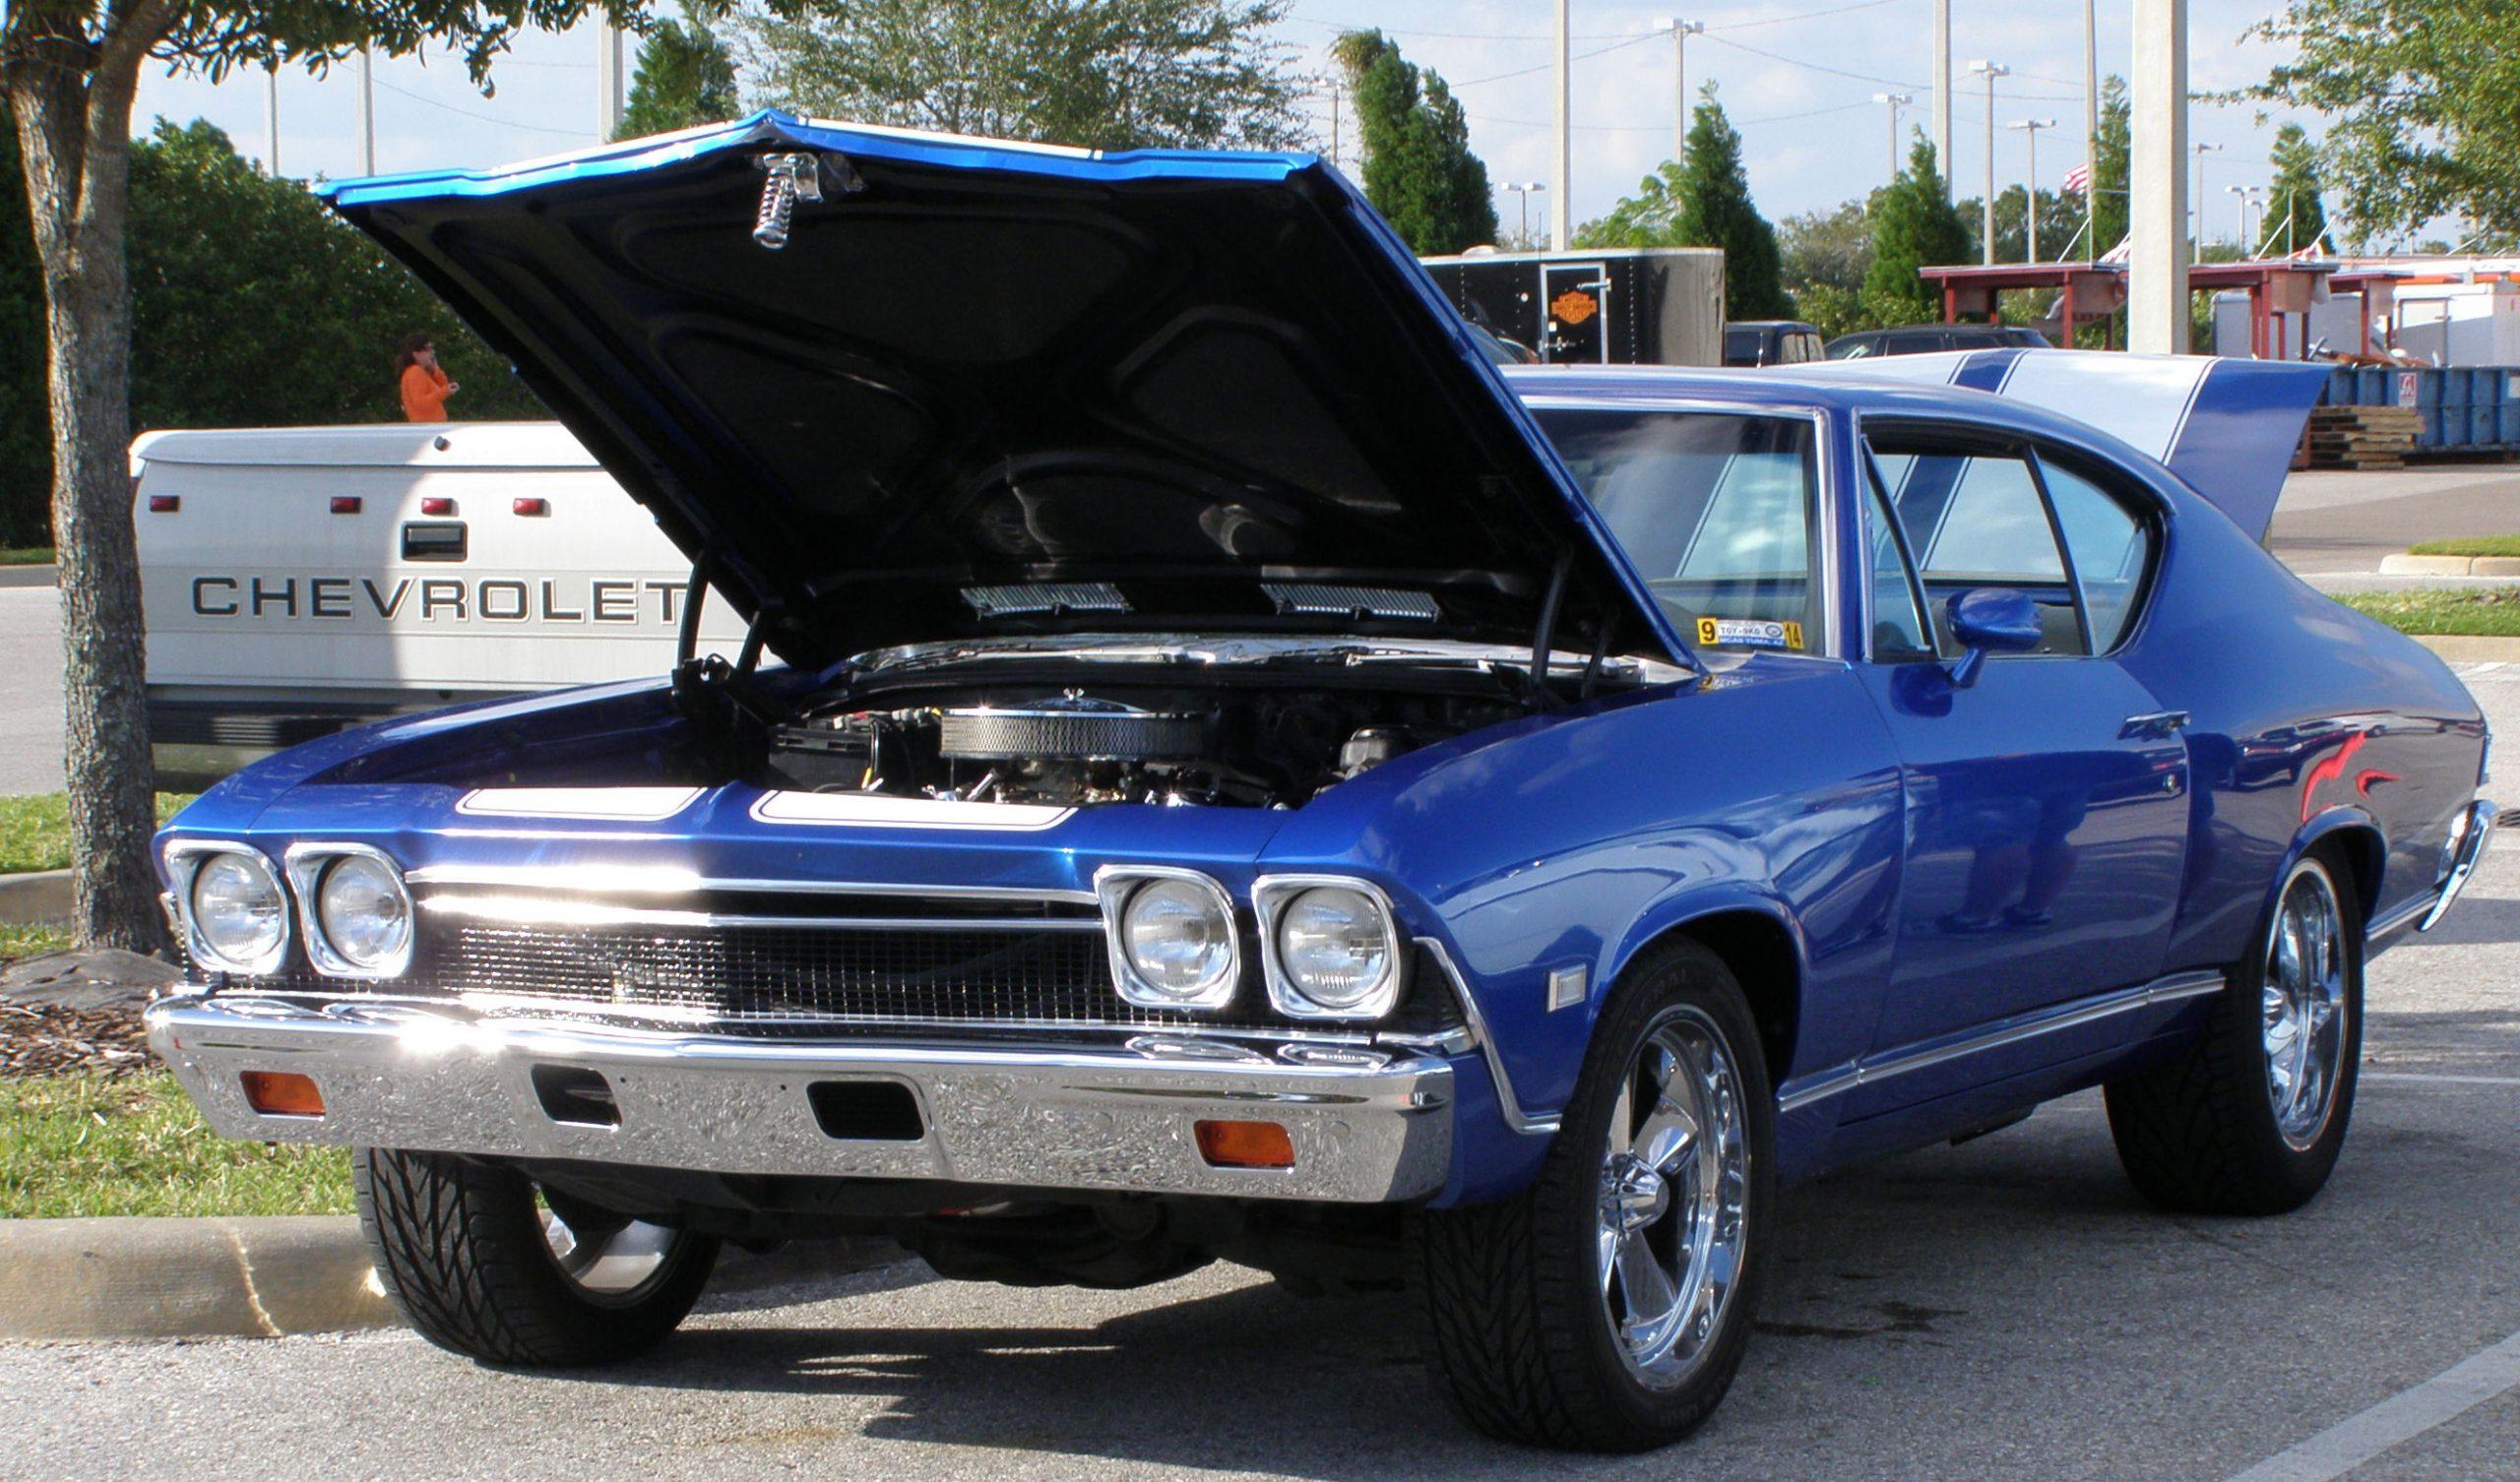 4th ANNUAL FIELD OF DREAMS CAR SHOW